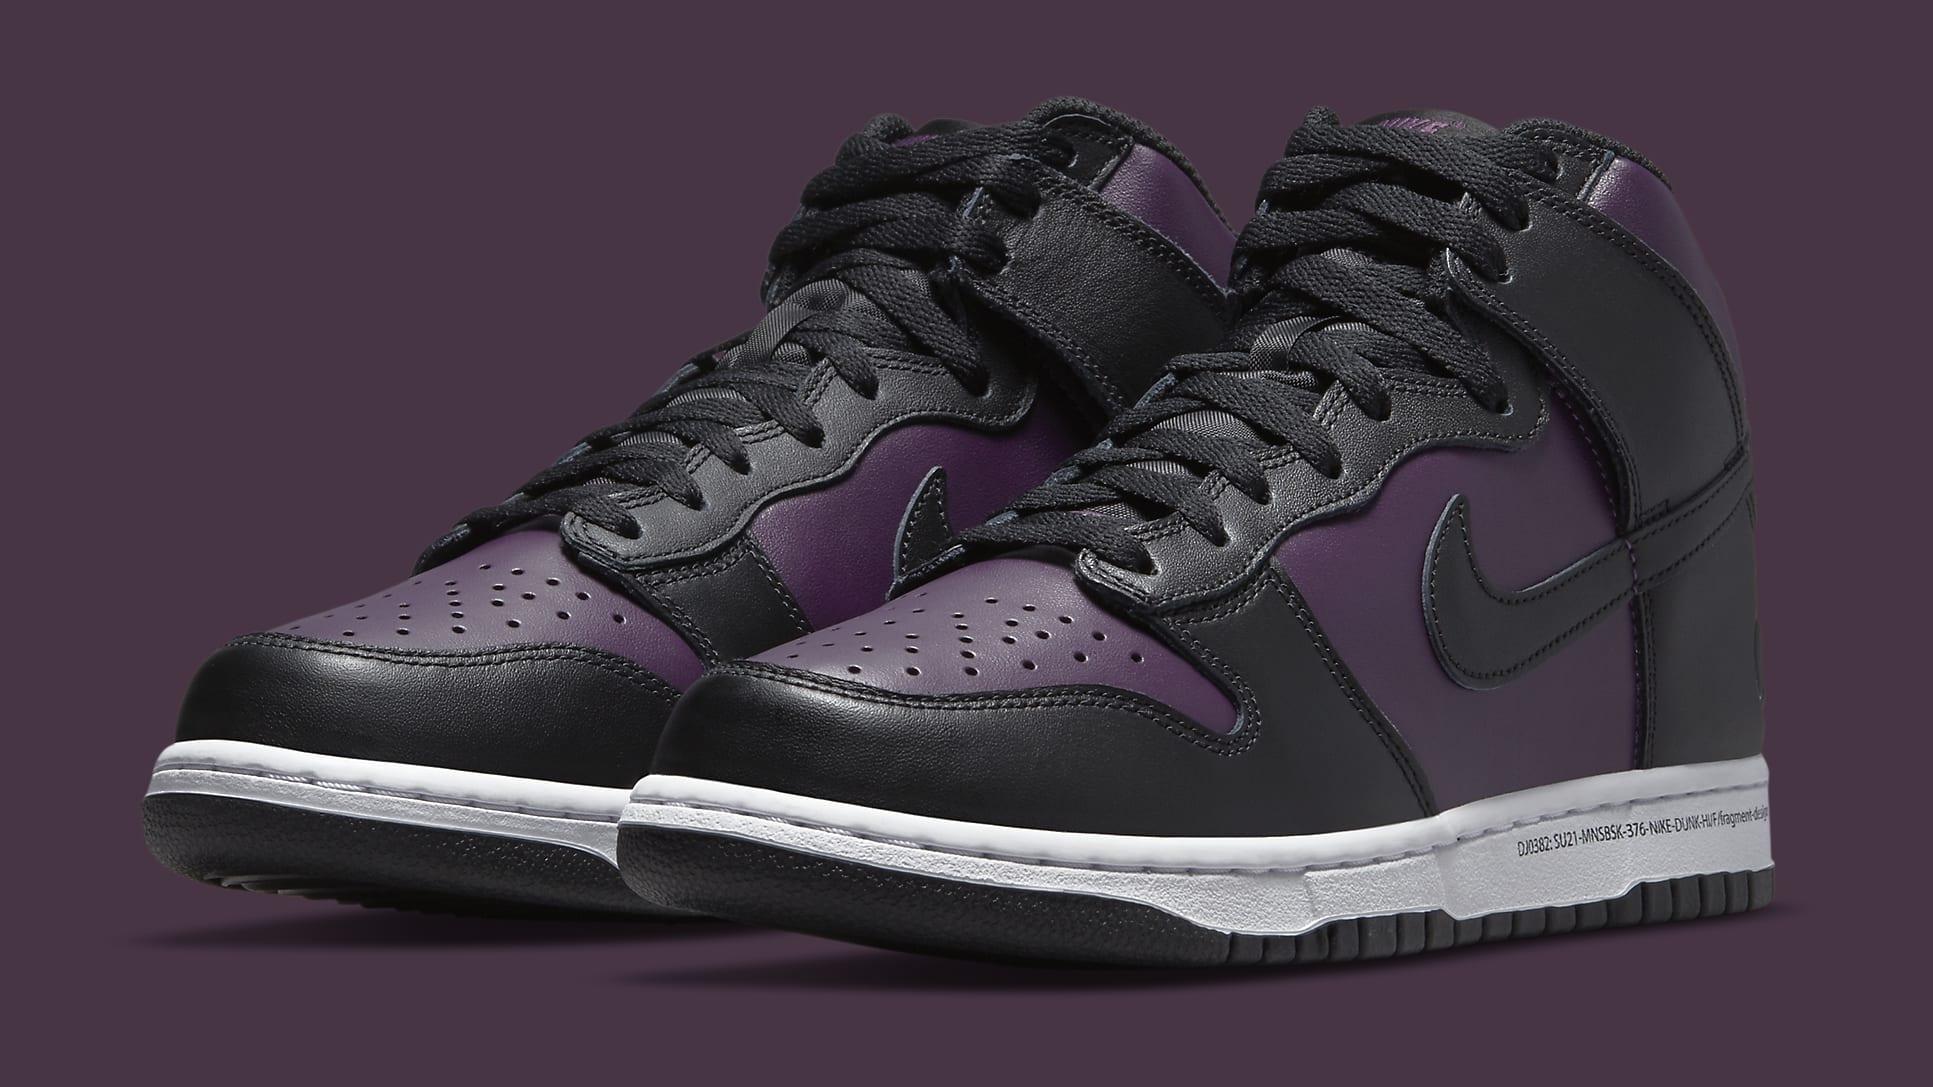 Fragment Design x Nike Dunk High 'Black' DJ0382-600 Pair